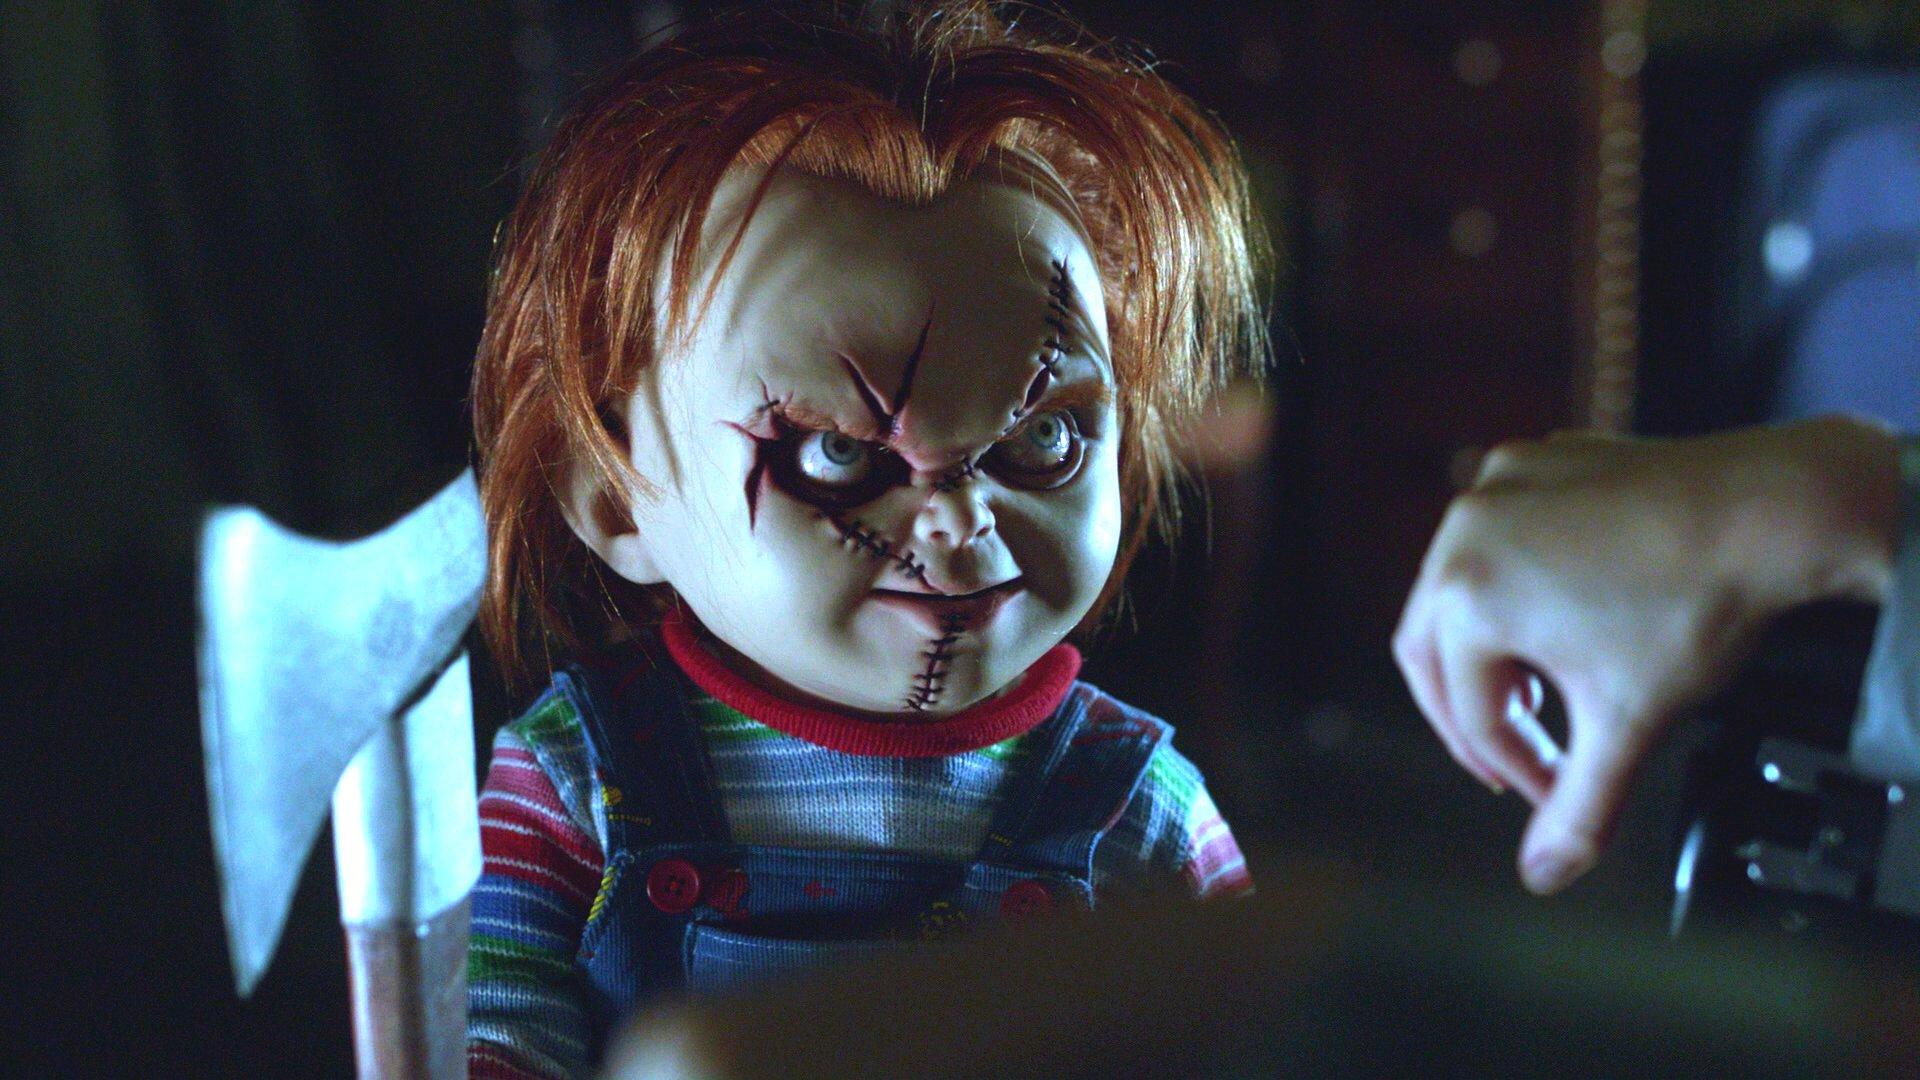 childs play chucky dark horror creepy scary (22) wallpaper